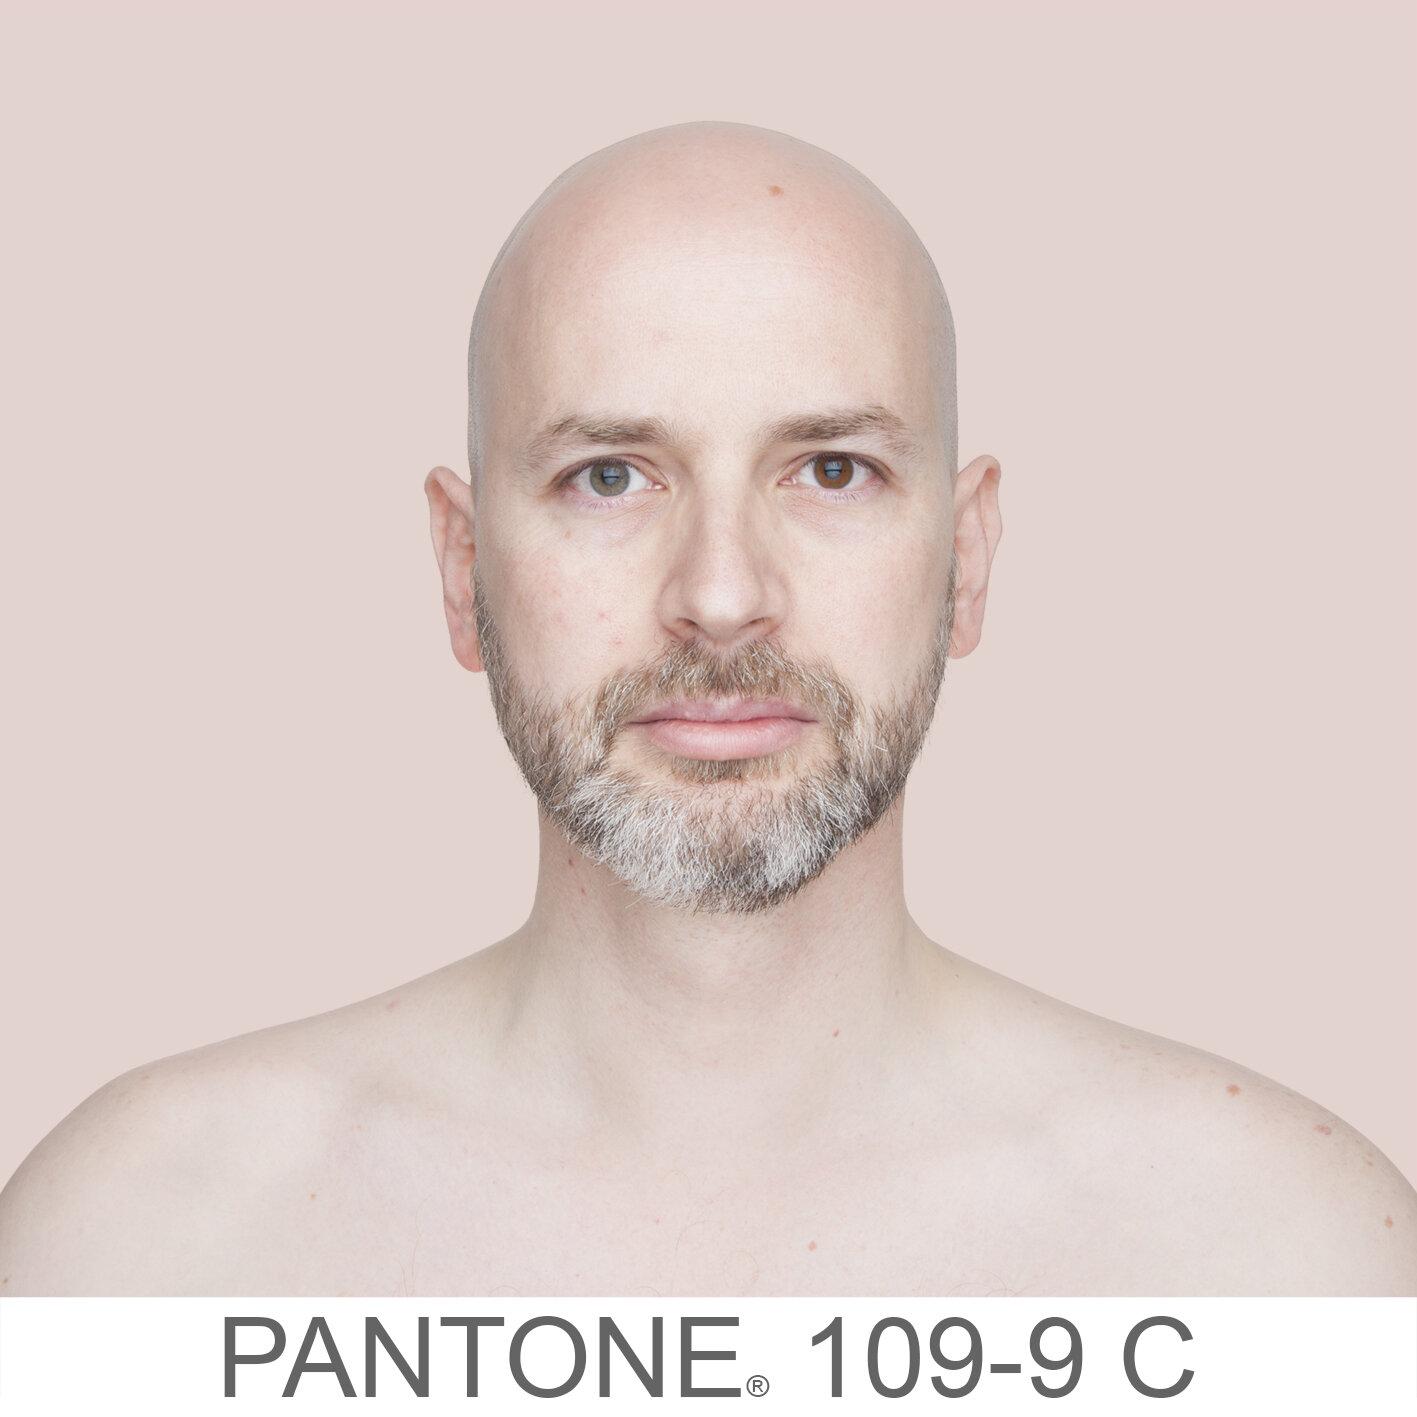 Humanae 109-9 C atx copia.jpg